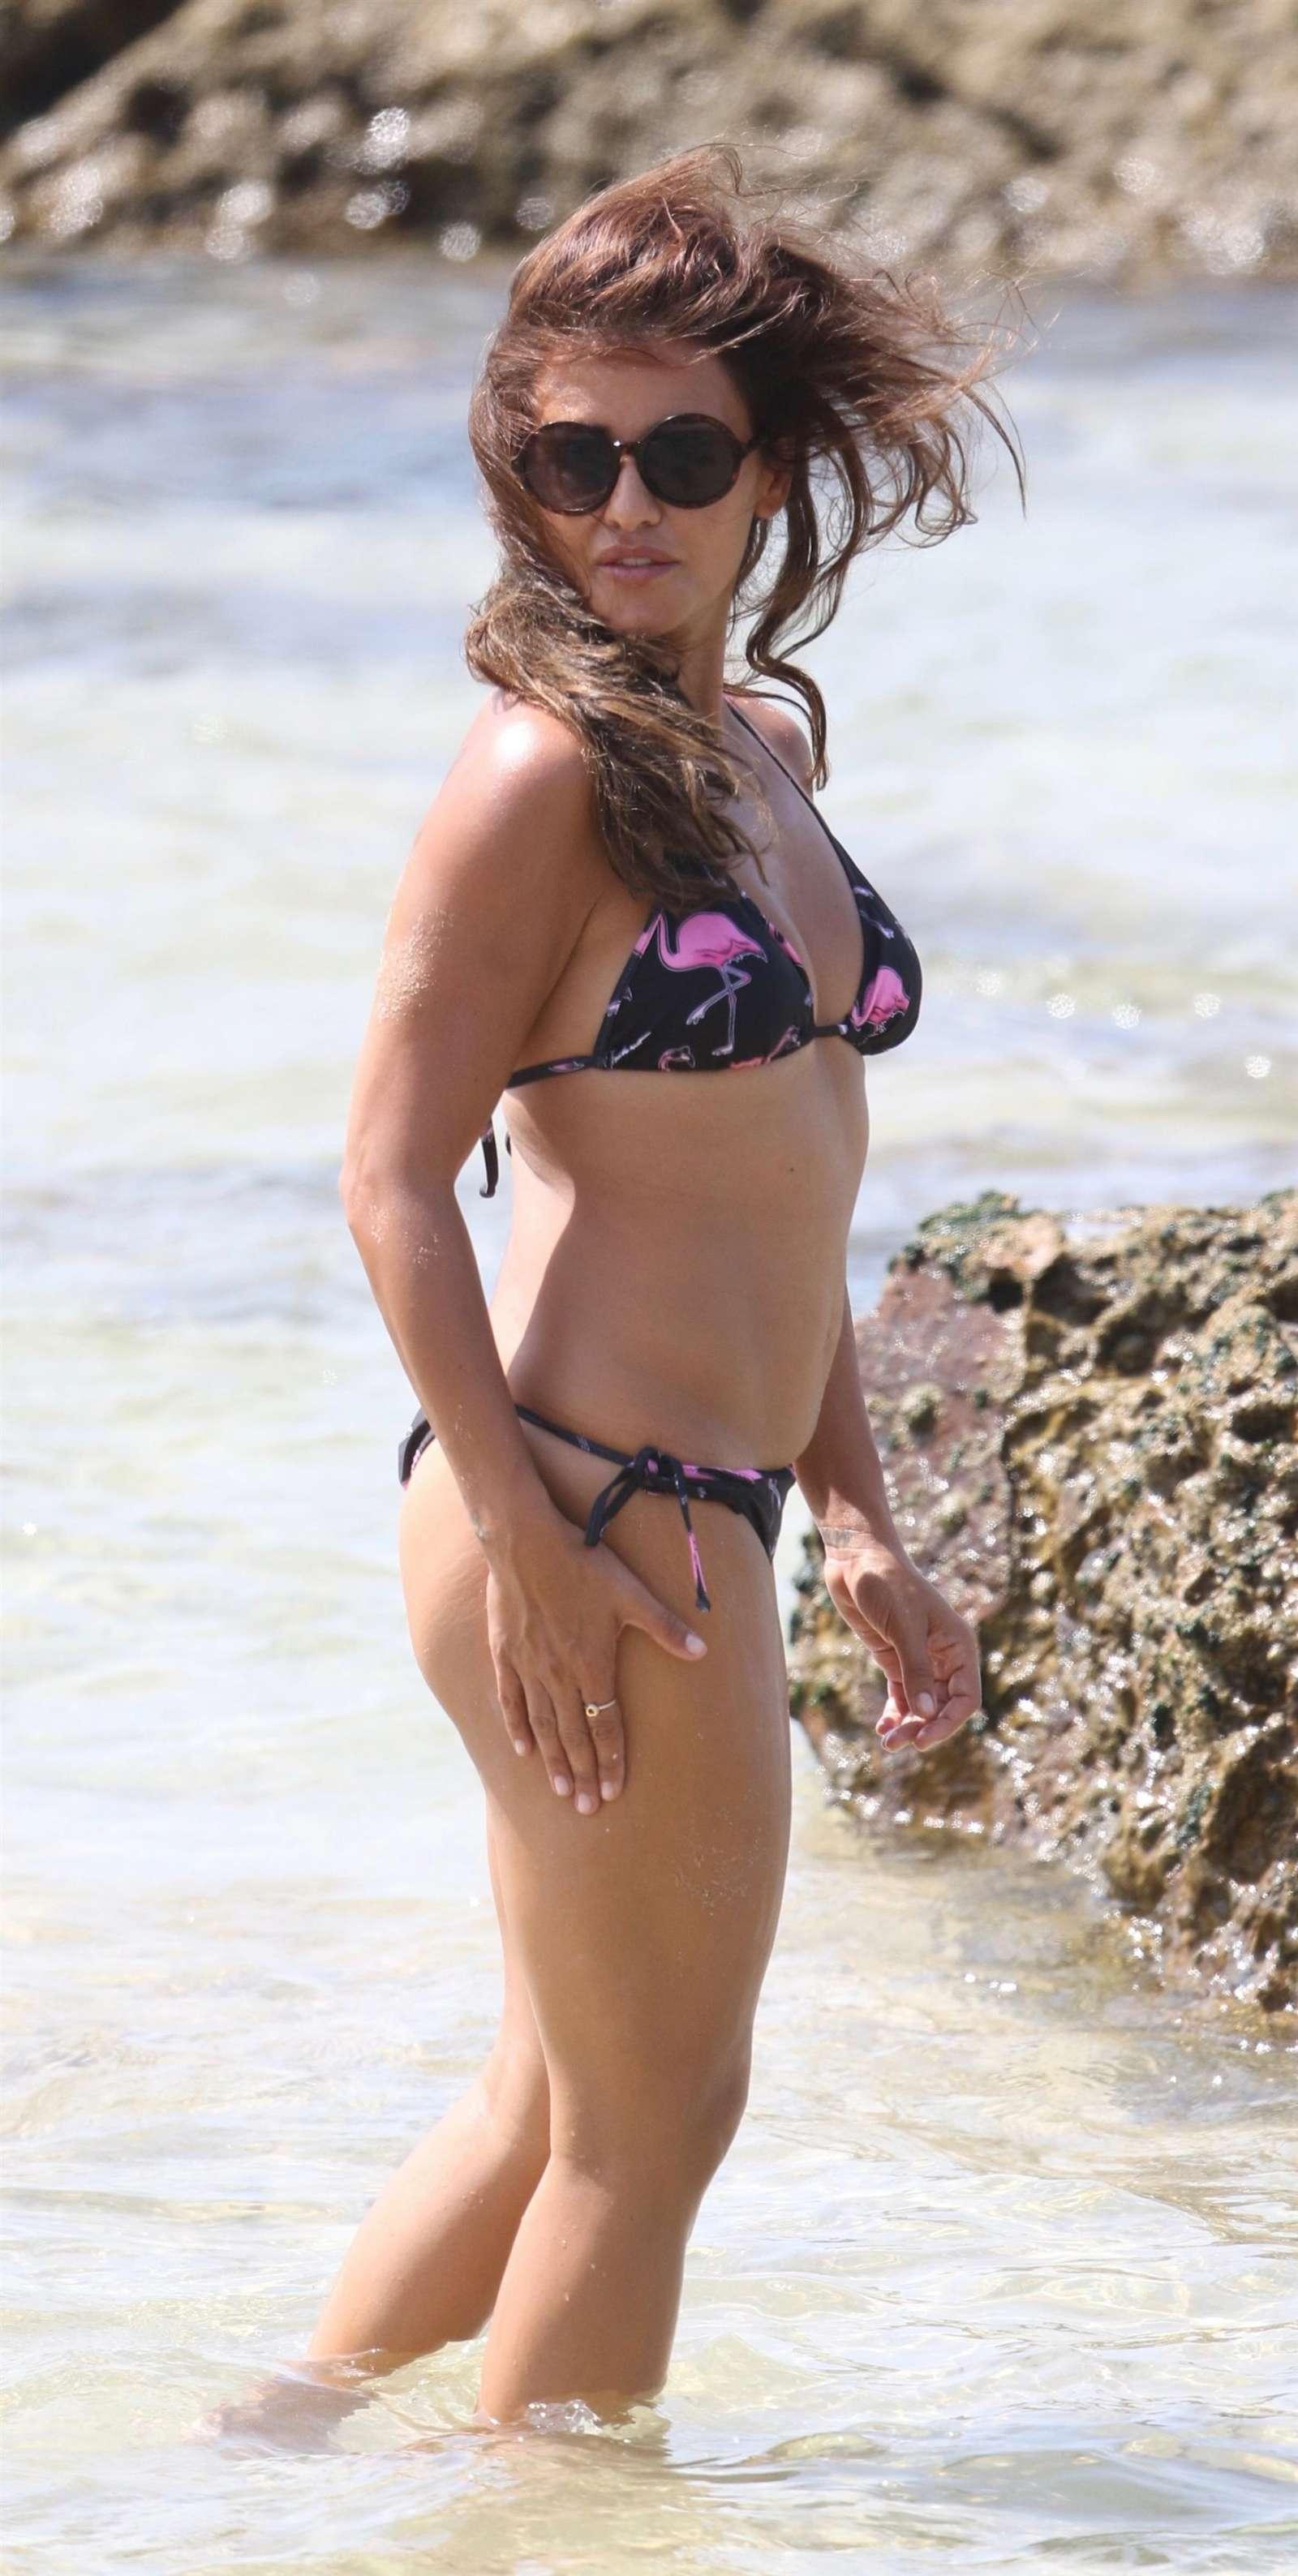 Monica Cruz 2017 : Monica Cruz in Bikini 2017 -97